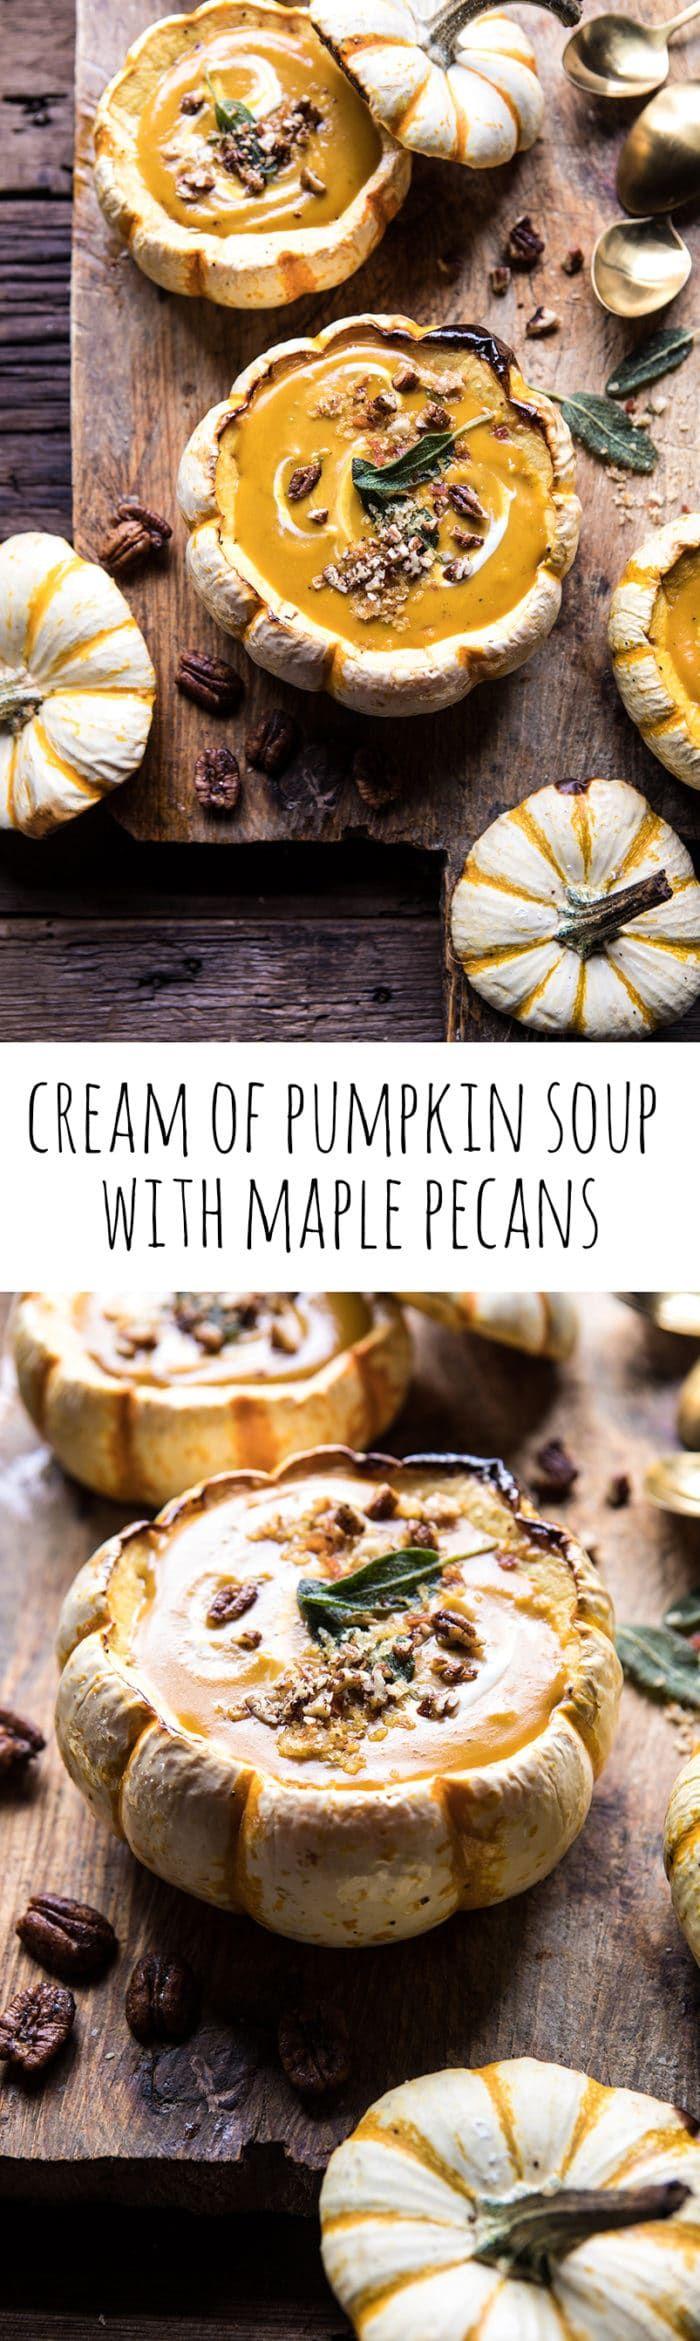 Cream of Pumpkin Soup with Maple Pecans | halfbakedharvest.com @hbharvest